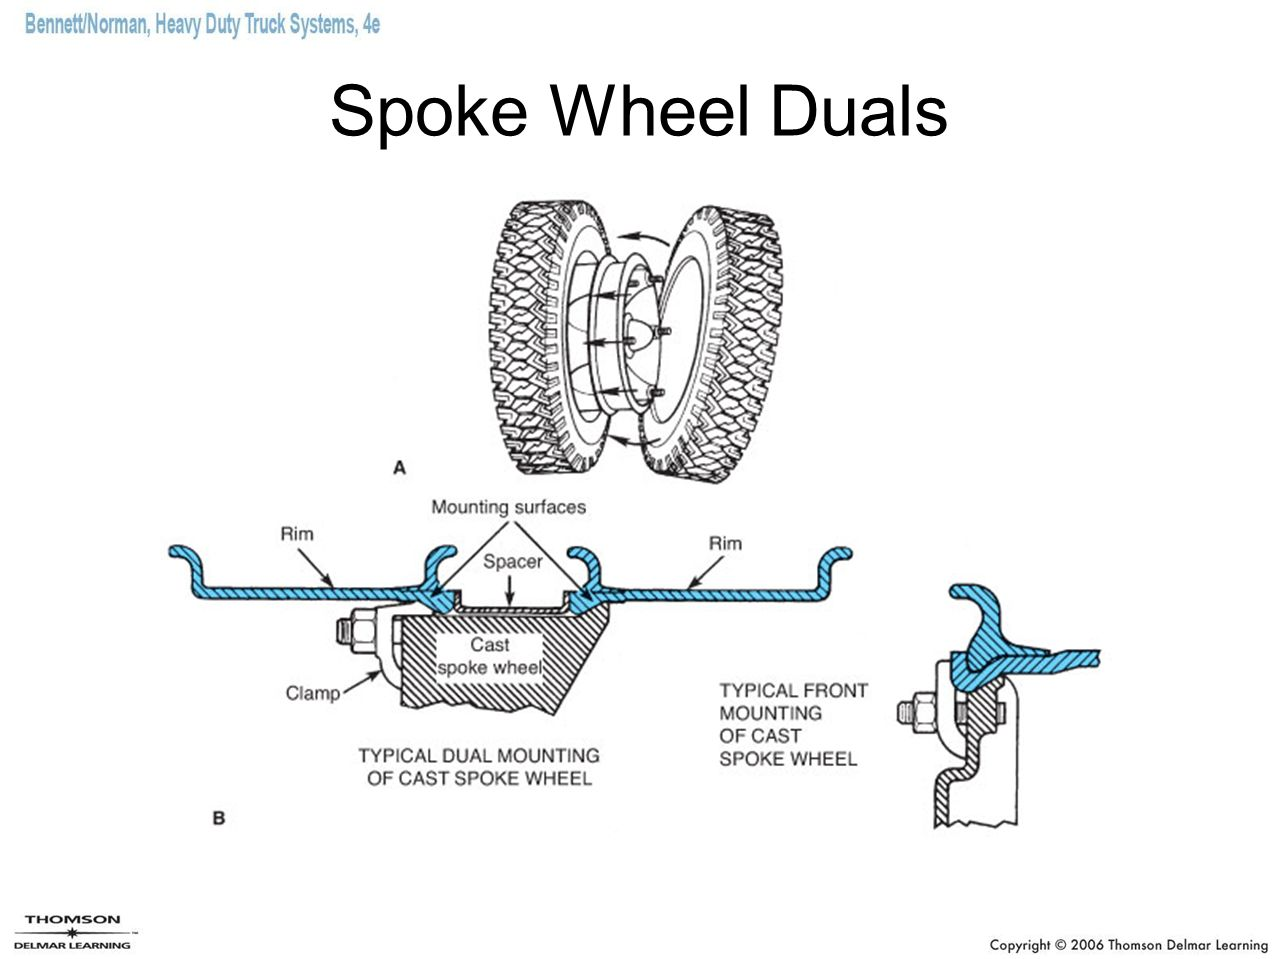 hight resolution of 5 spoke wheel duals